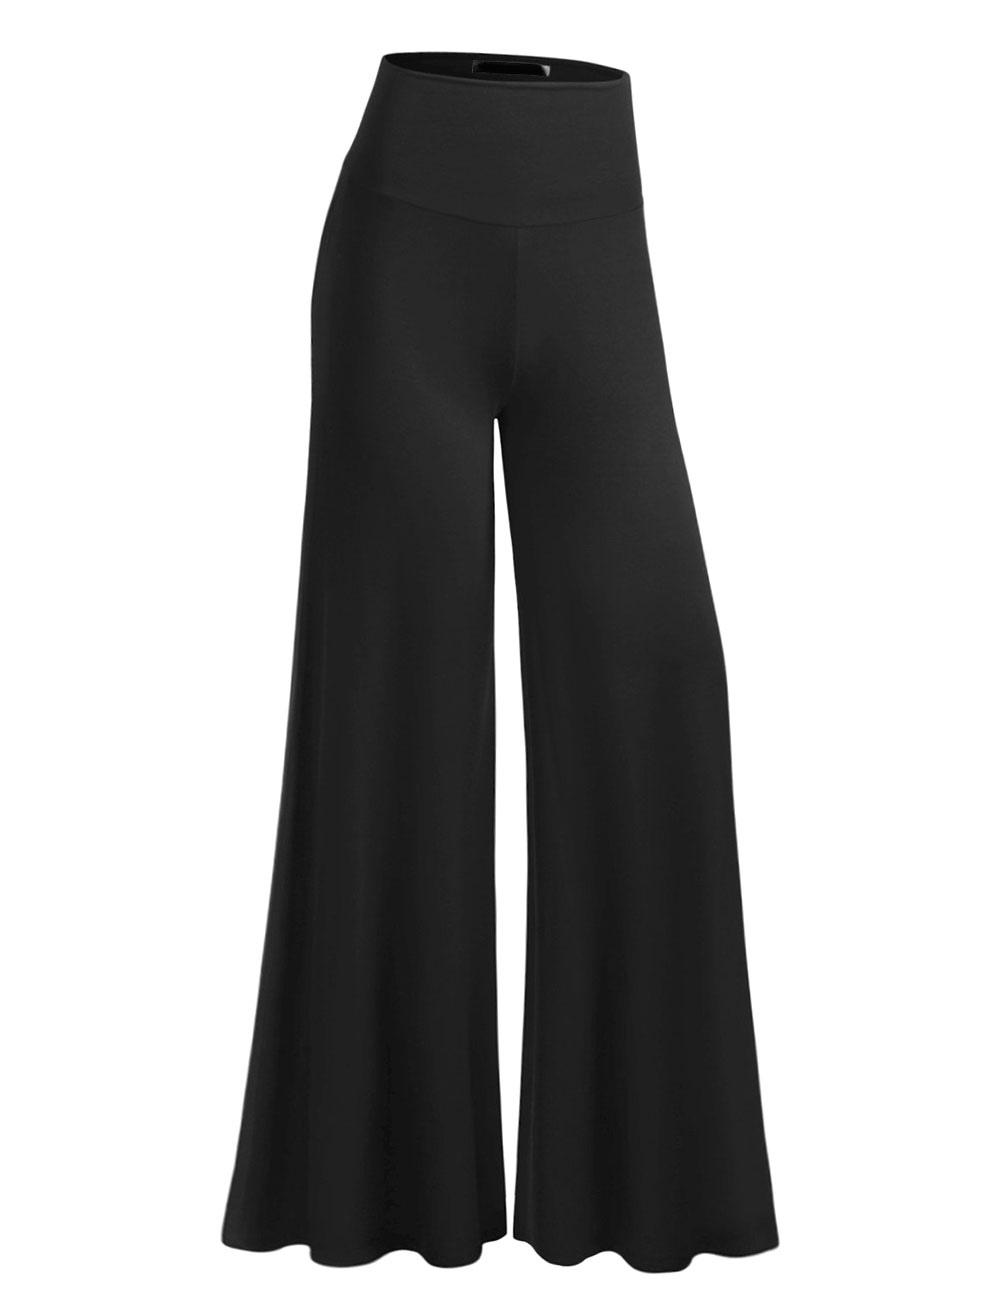 Cotton Black Pants Women's High Rise Ruffled Elastic Wide Leg Pants Cheap clothes, free shipping worldwide